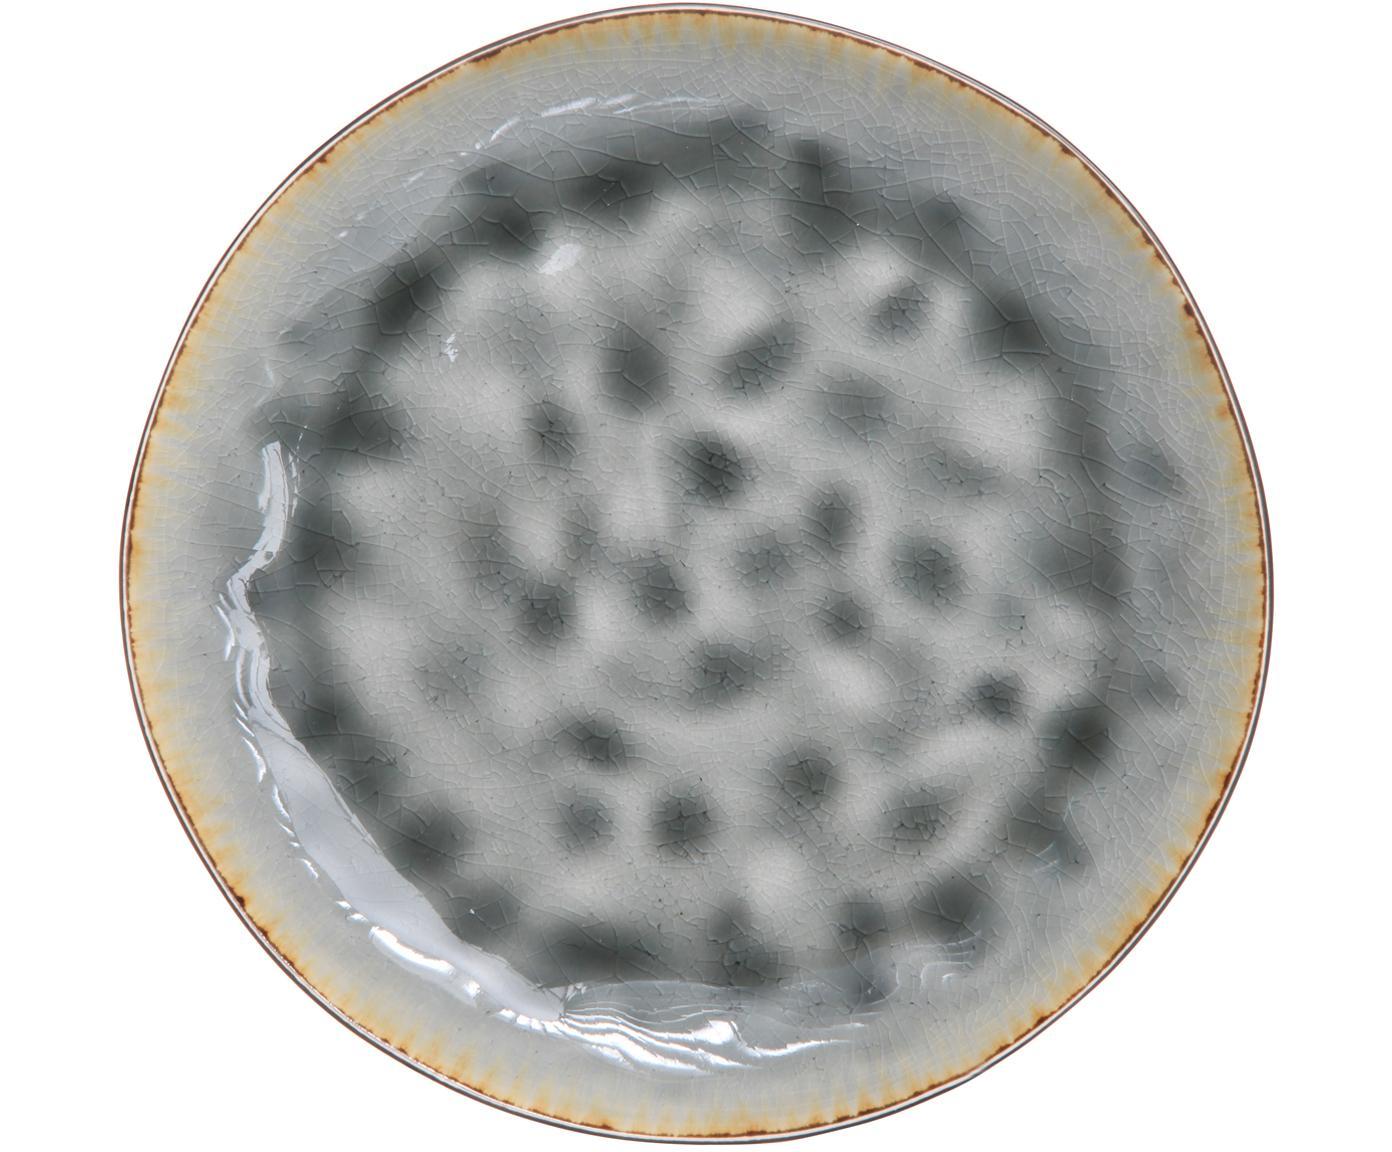 Piatto da colazione Lagune 6 pz, Ceramica, Marrone grigiastro, toni verdi, Ø 20 cm